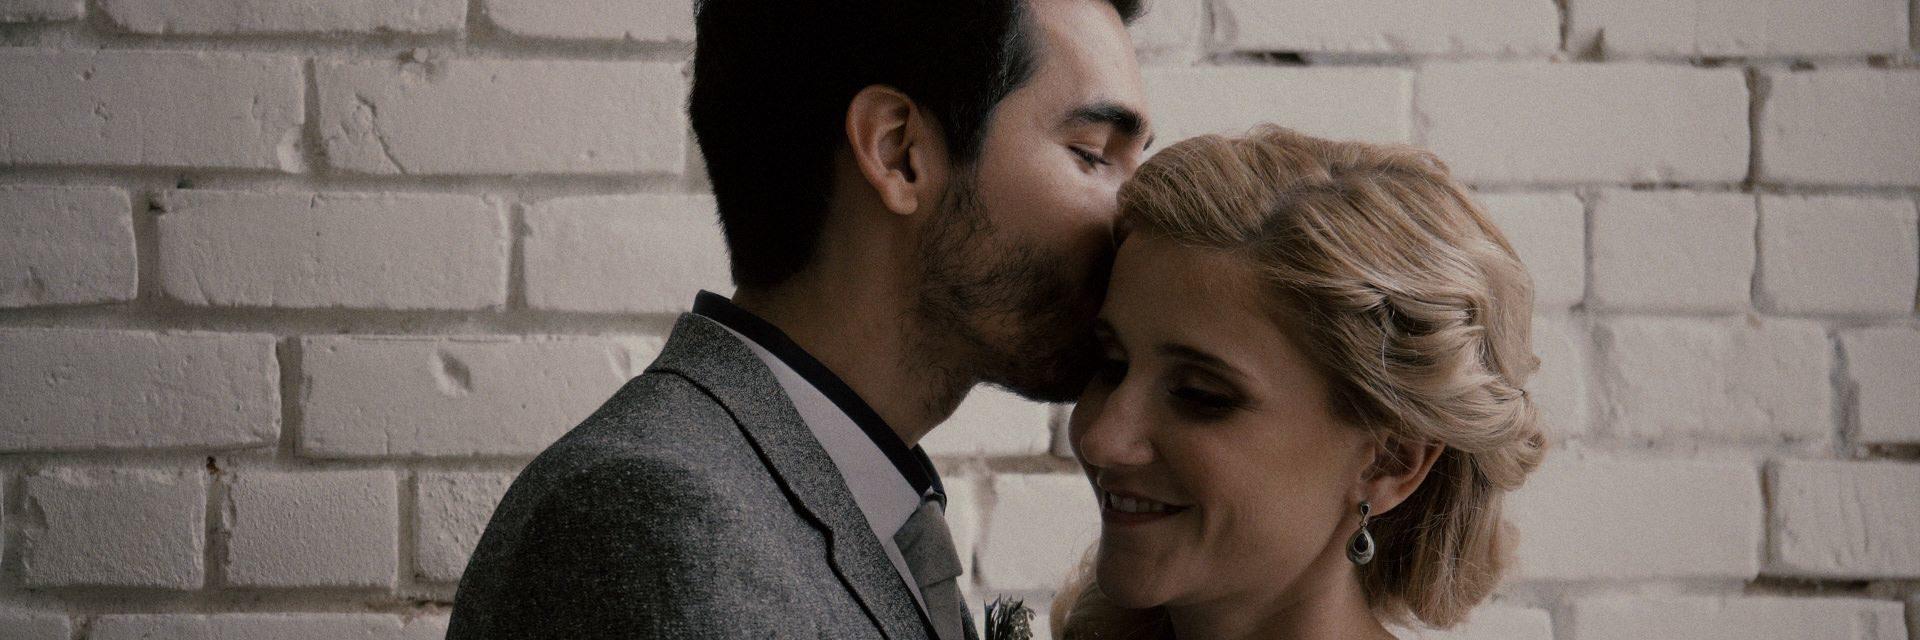 florance-wedding-videographer-cinemate-films-03